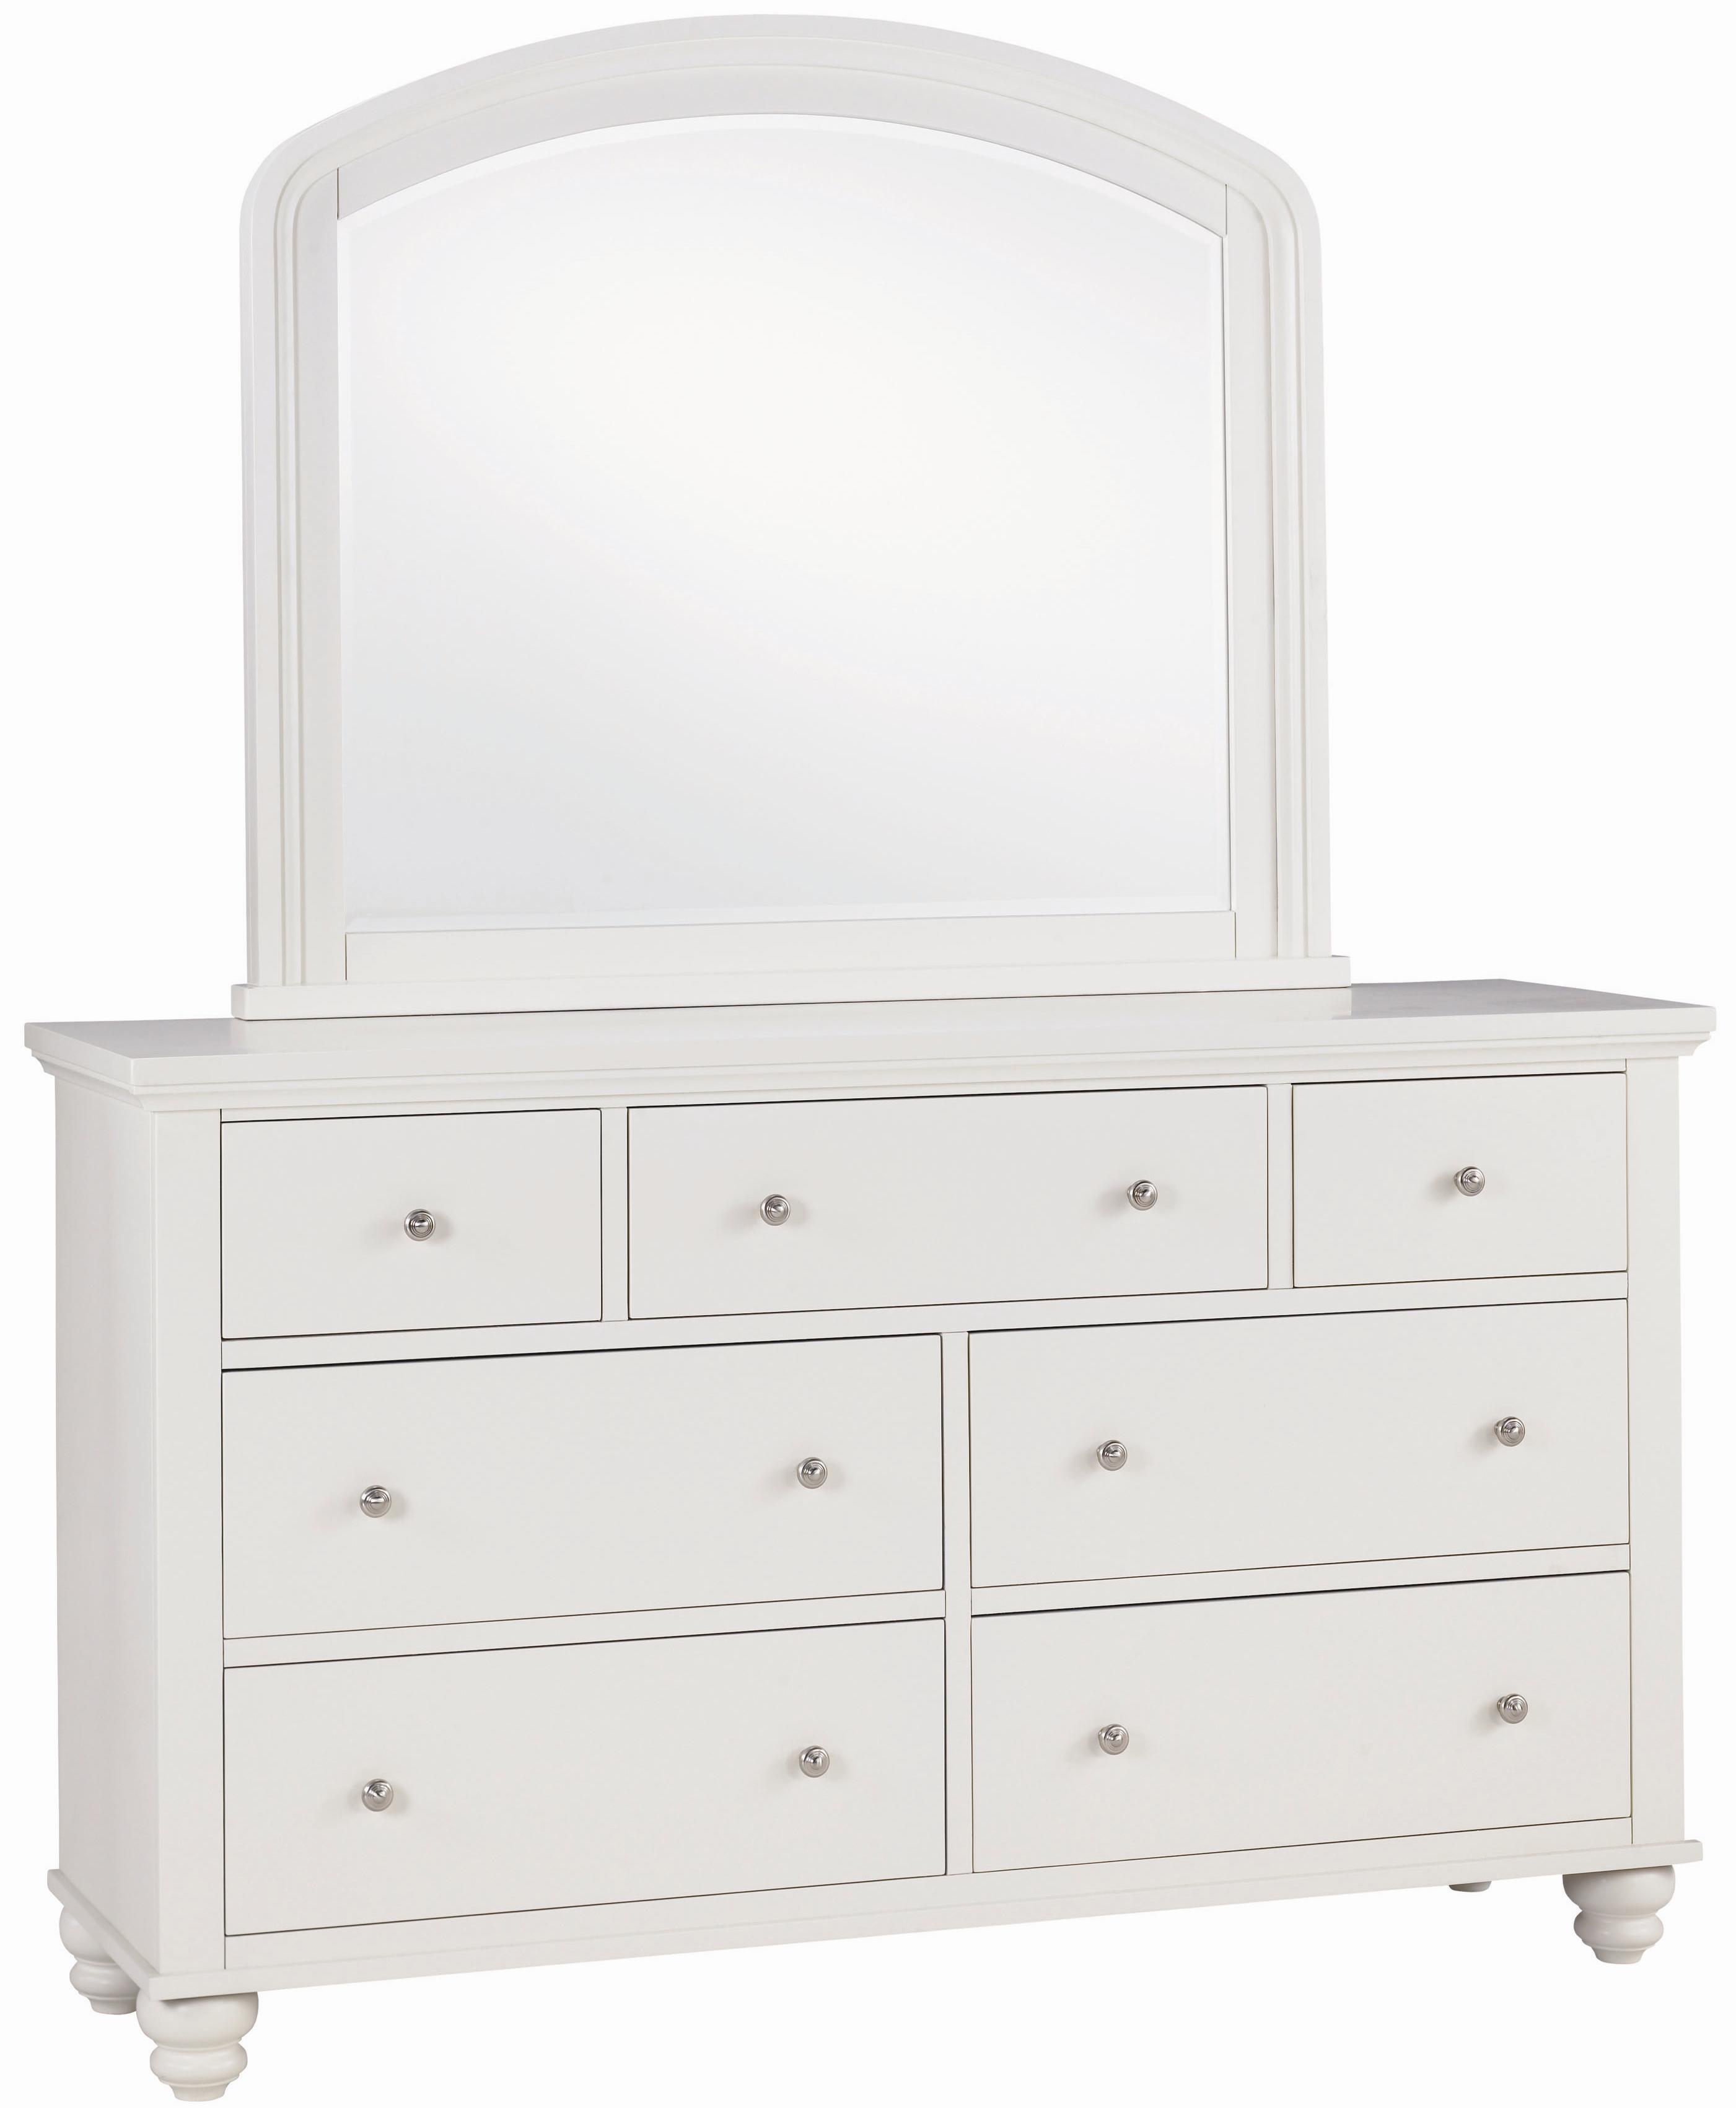 Aspenhome Cambridge Double Dresser & Mirror Combo - Item Number: ICB-454+462-EGG